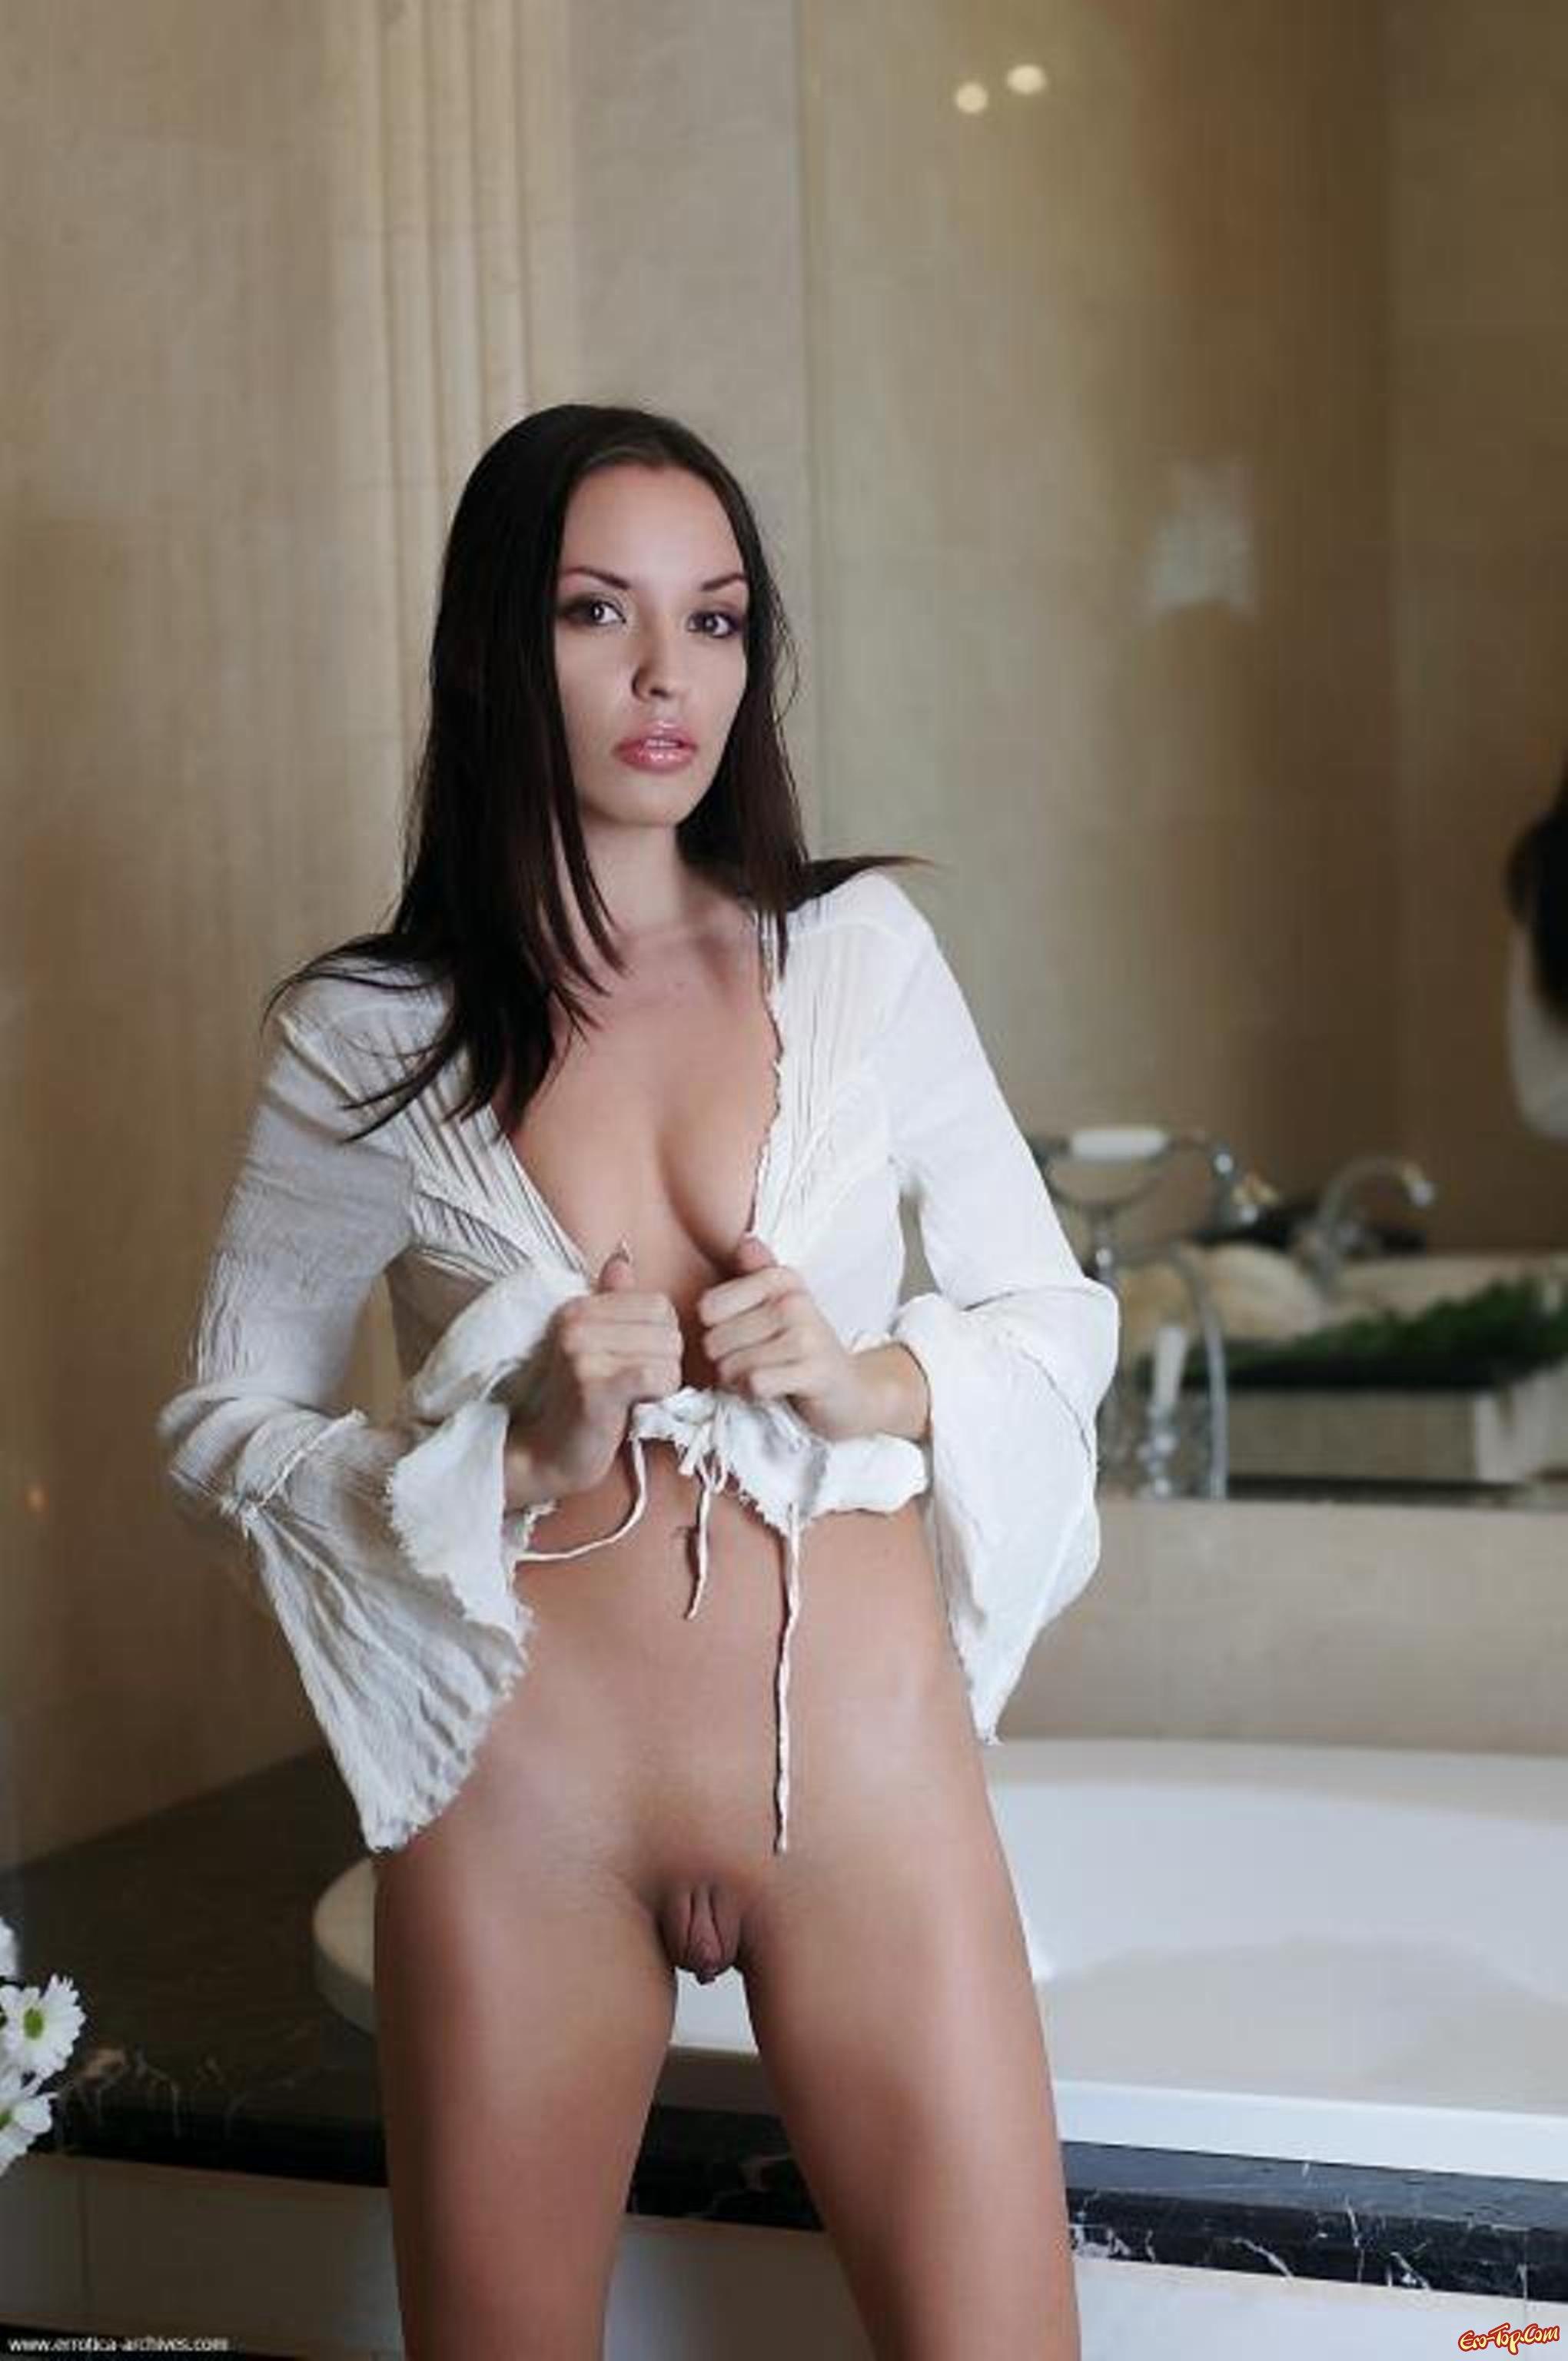 Влажная ухоженная киска секс фото